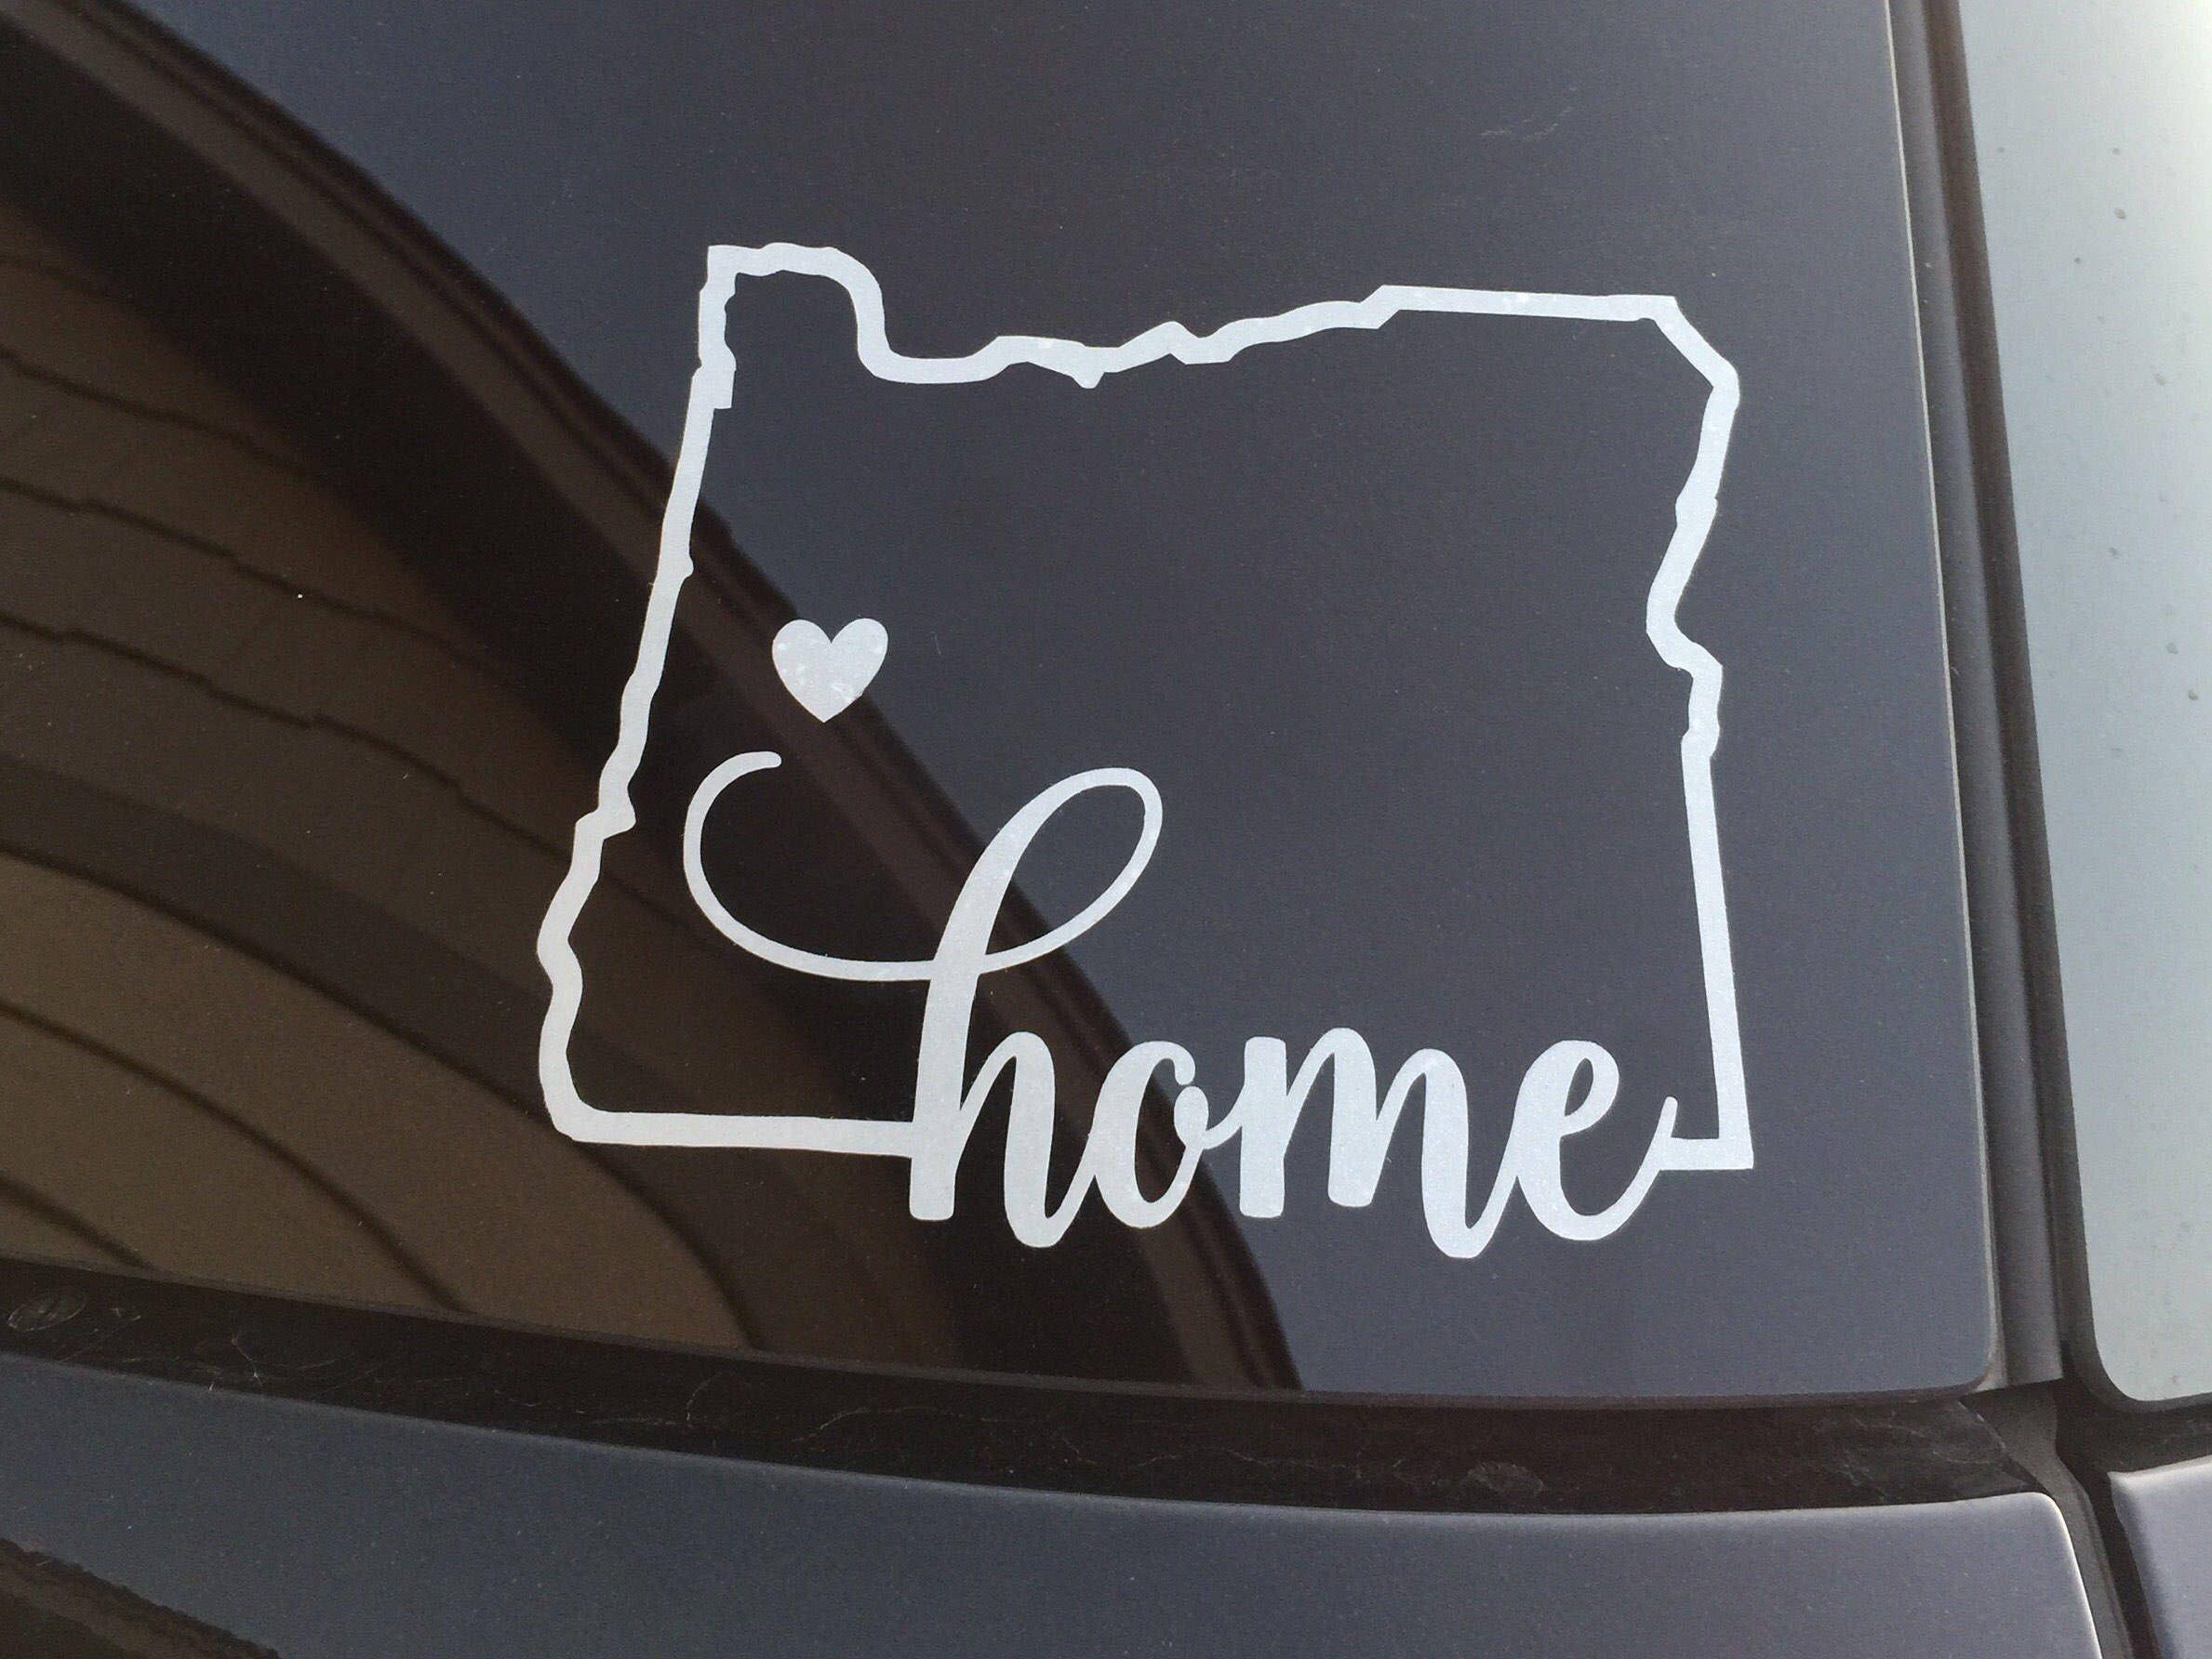 Oregon Home Window Decal Oregon Silhouette Decal Sticker Car Window Decal Wall Sticker Labtop Decal Vinyl Art I Window Decals Car Decals Car Window Decals [ 1784 x 2378 Pixel ]